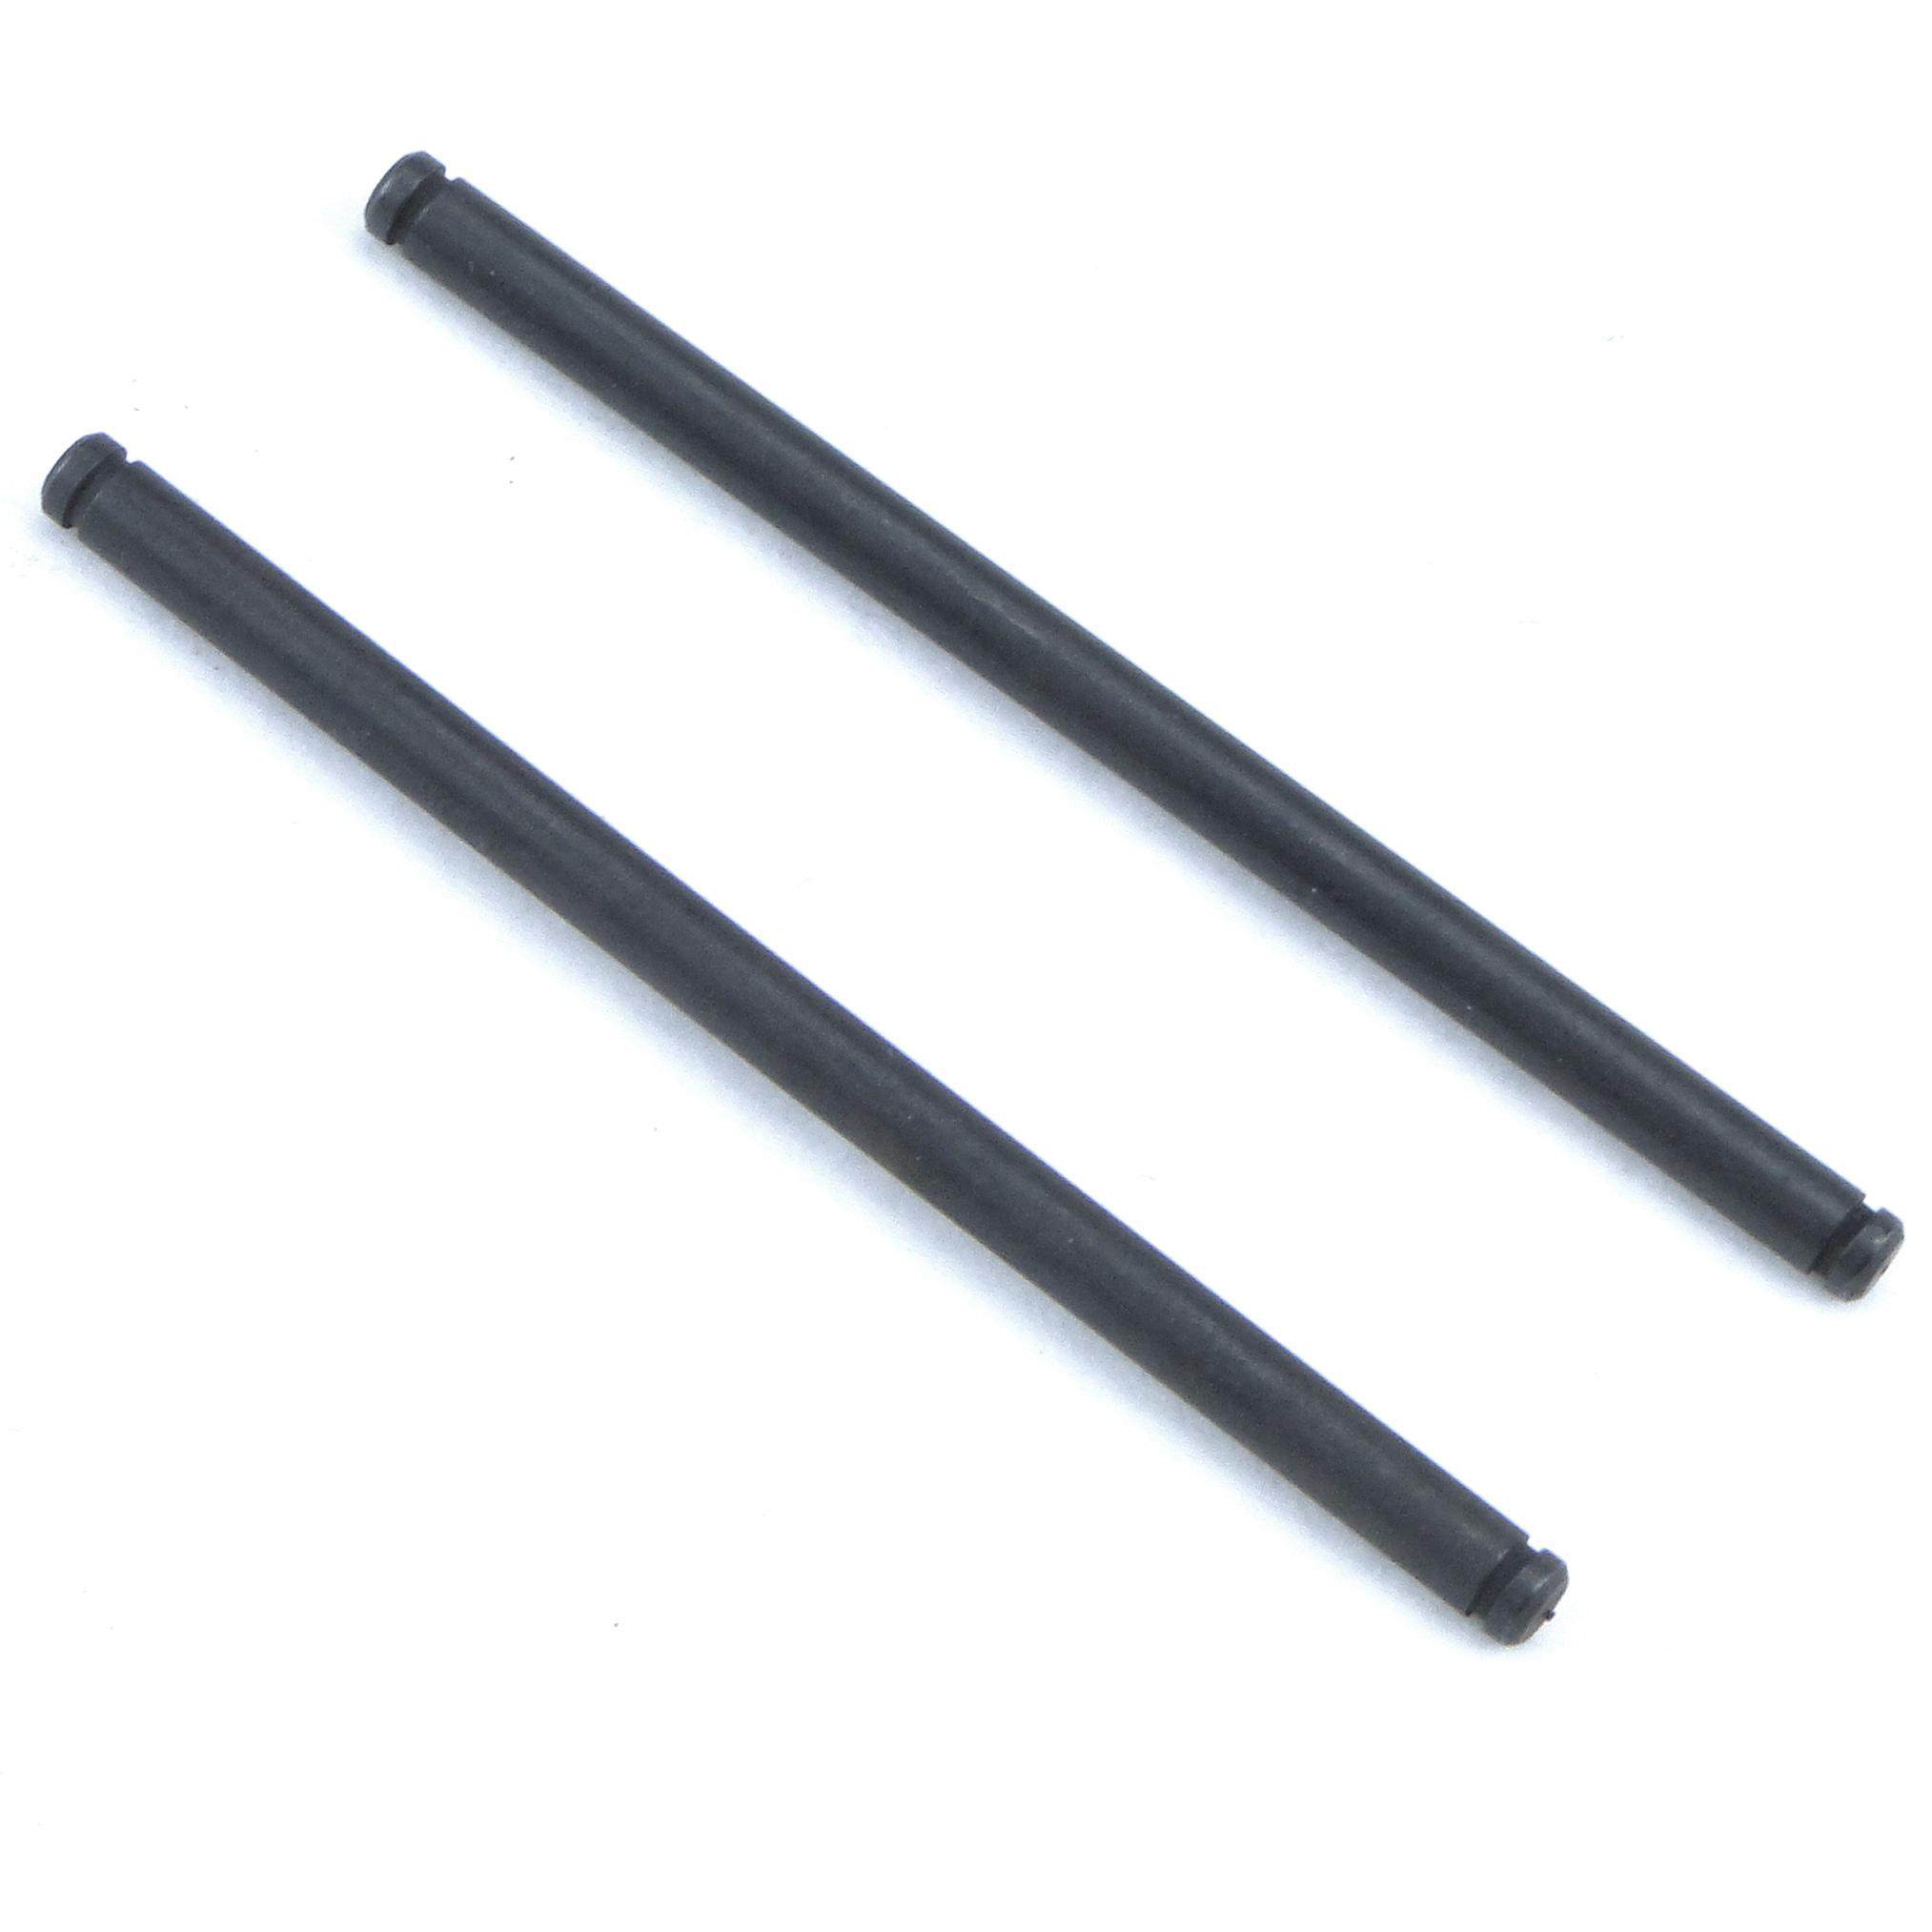 AMEWI 02063 Rear suspension arm pin A 2 Stück 004-02063